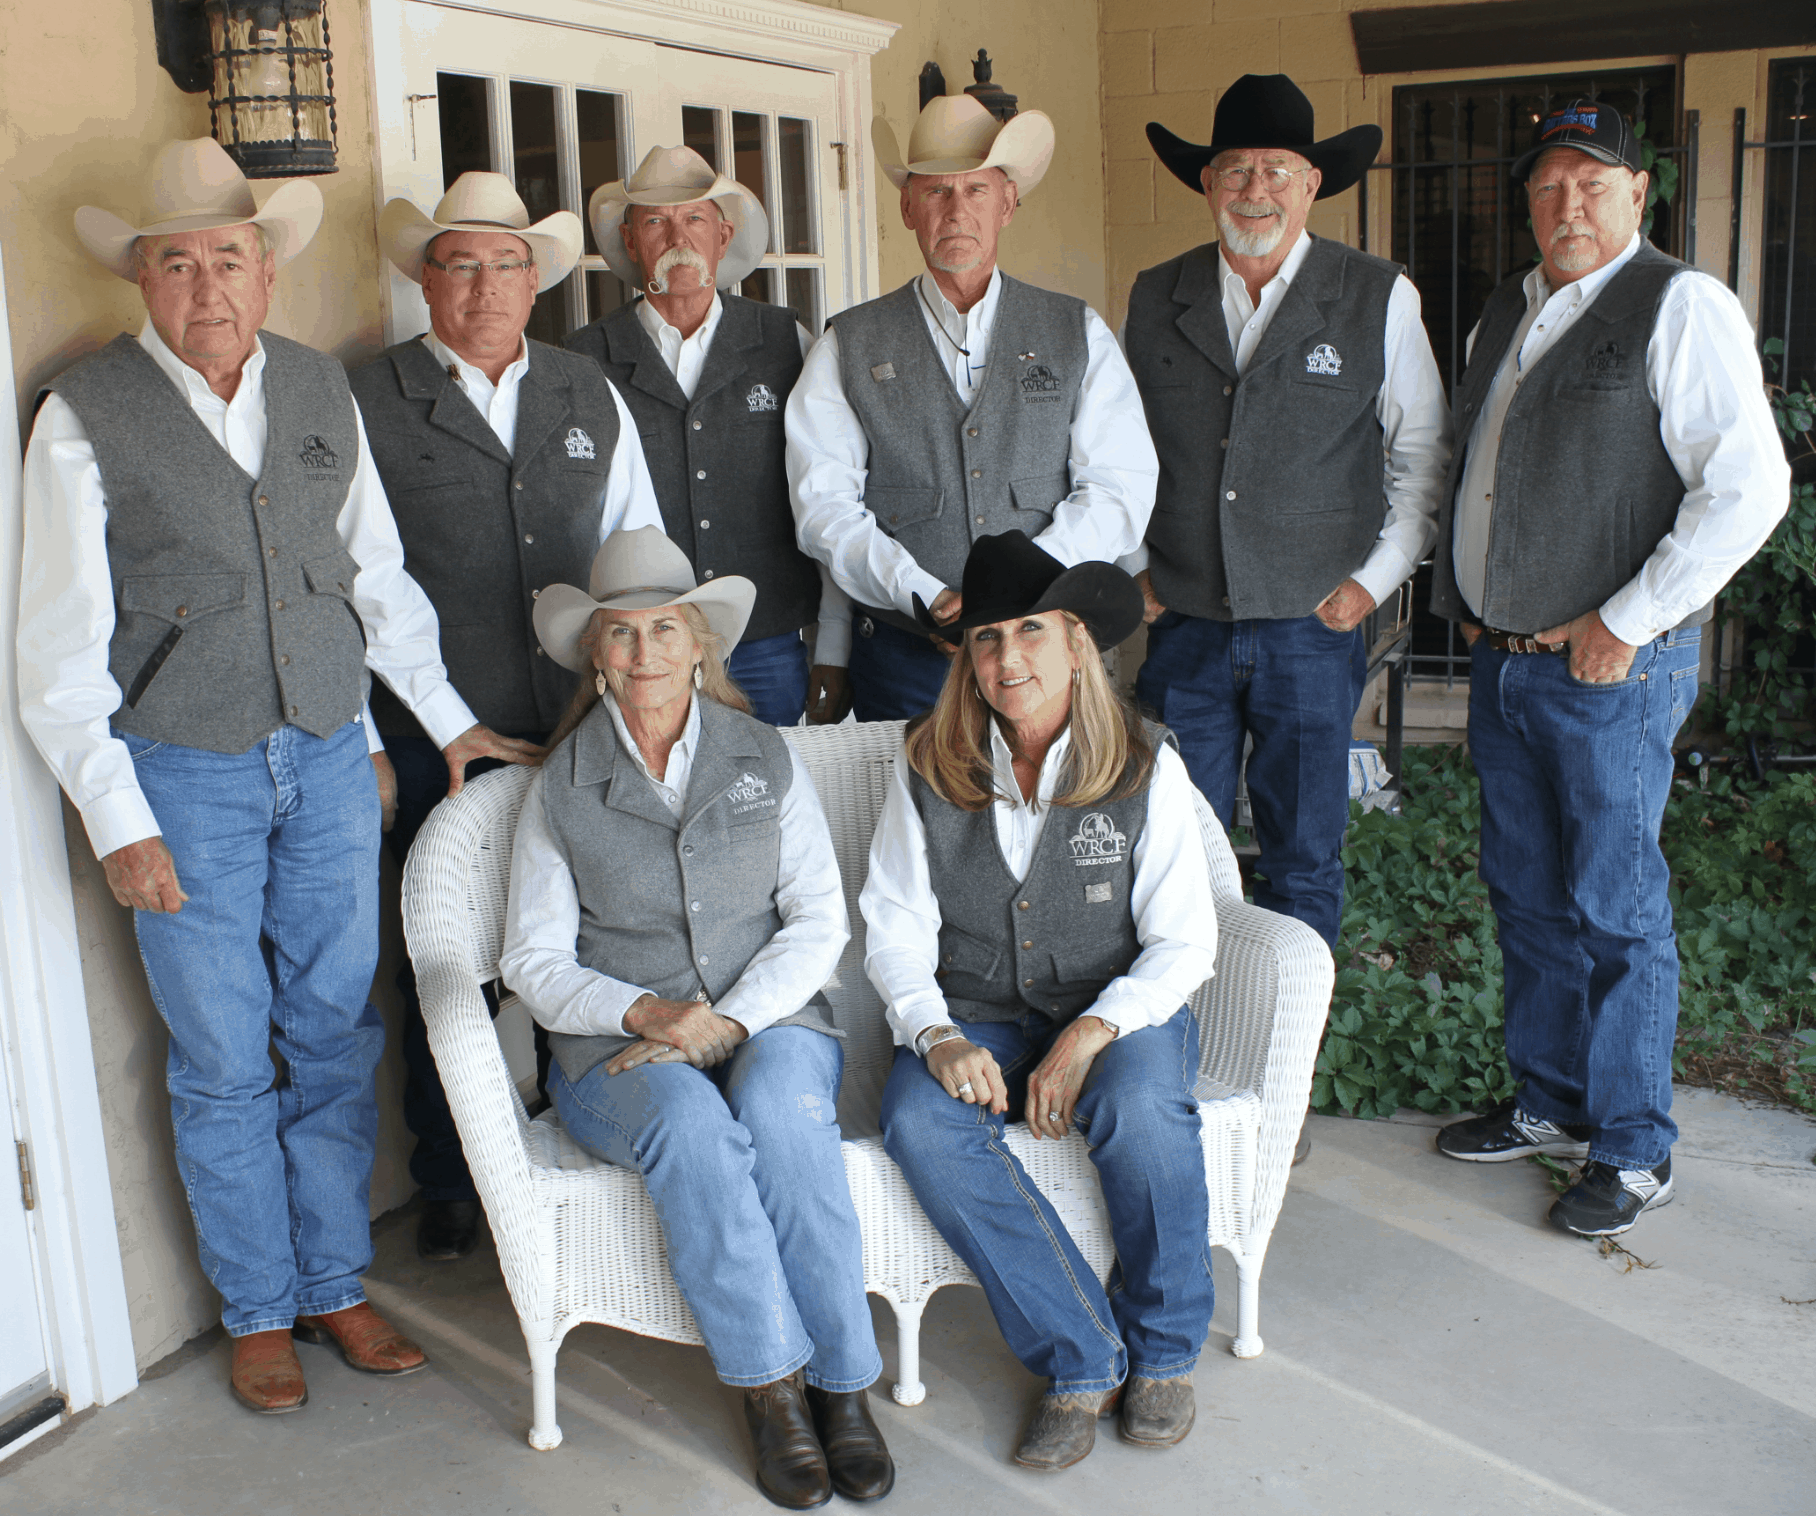 2015 Wrcf Board Of Directors Working Ranch Cowboys